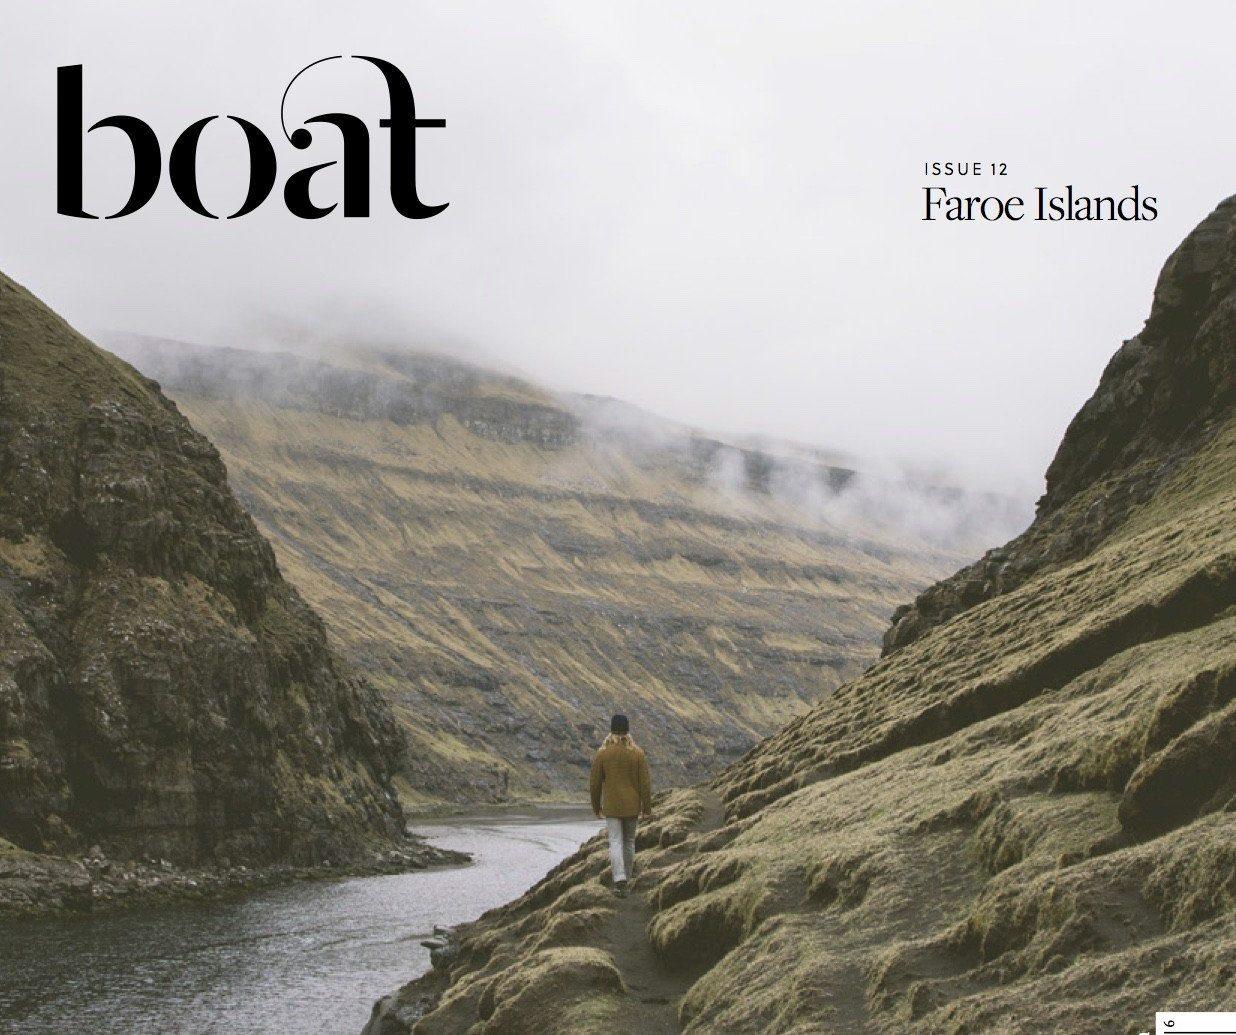 Arts + Culture Nature ecosystem terrain Coast screenshot geology cliff